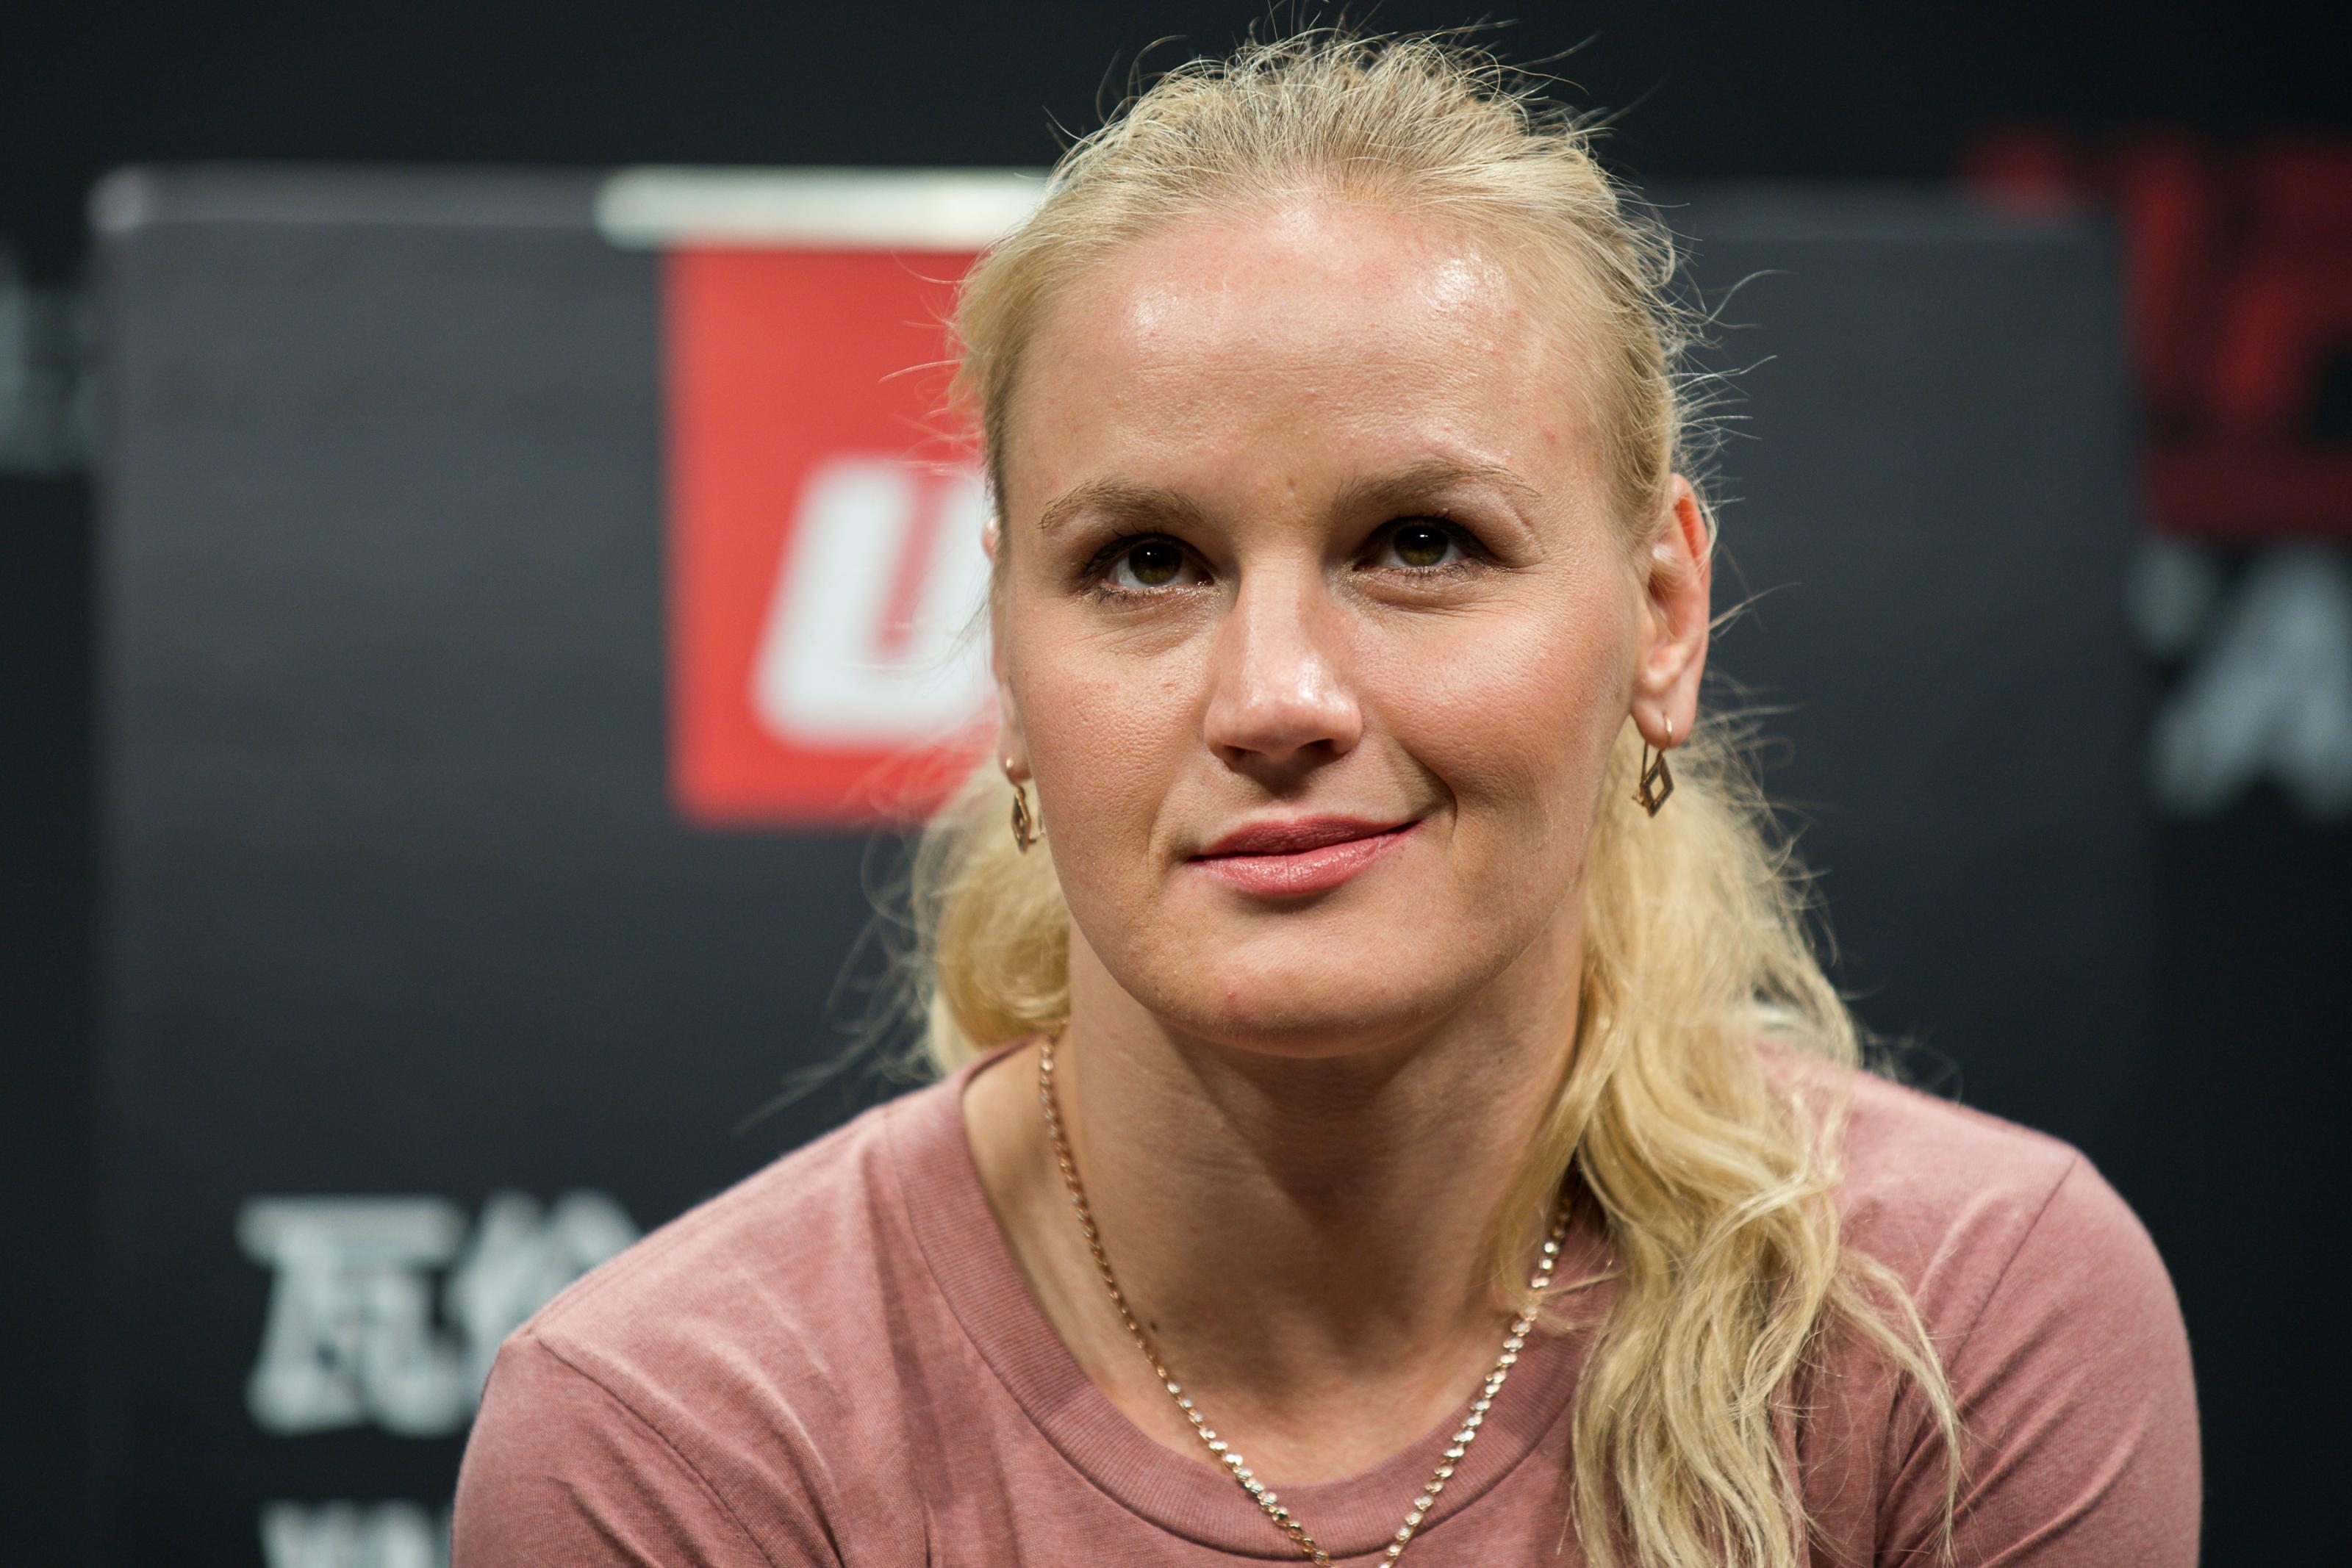 UFC 251: Valentina Schevchenko vs. Joanne Calderwood early preview and prediction